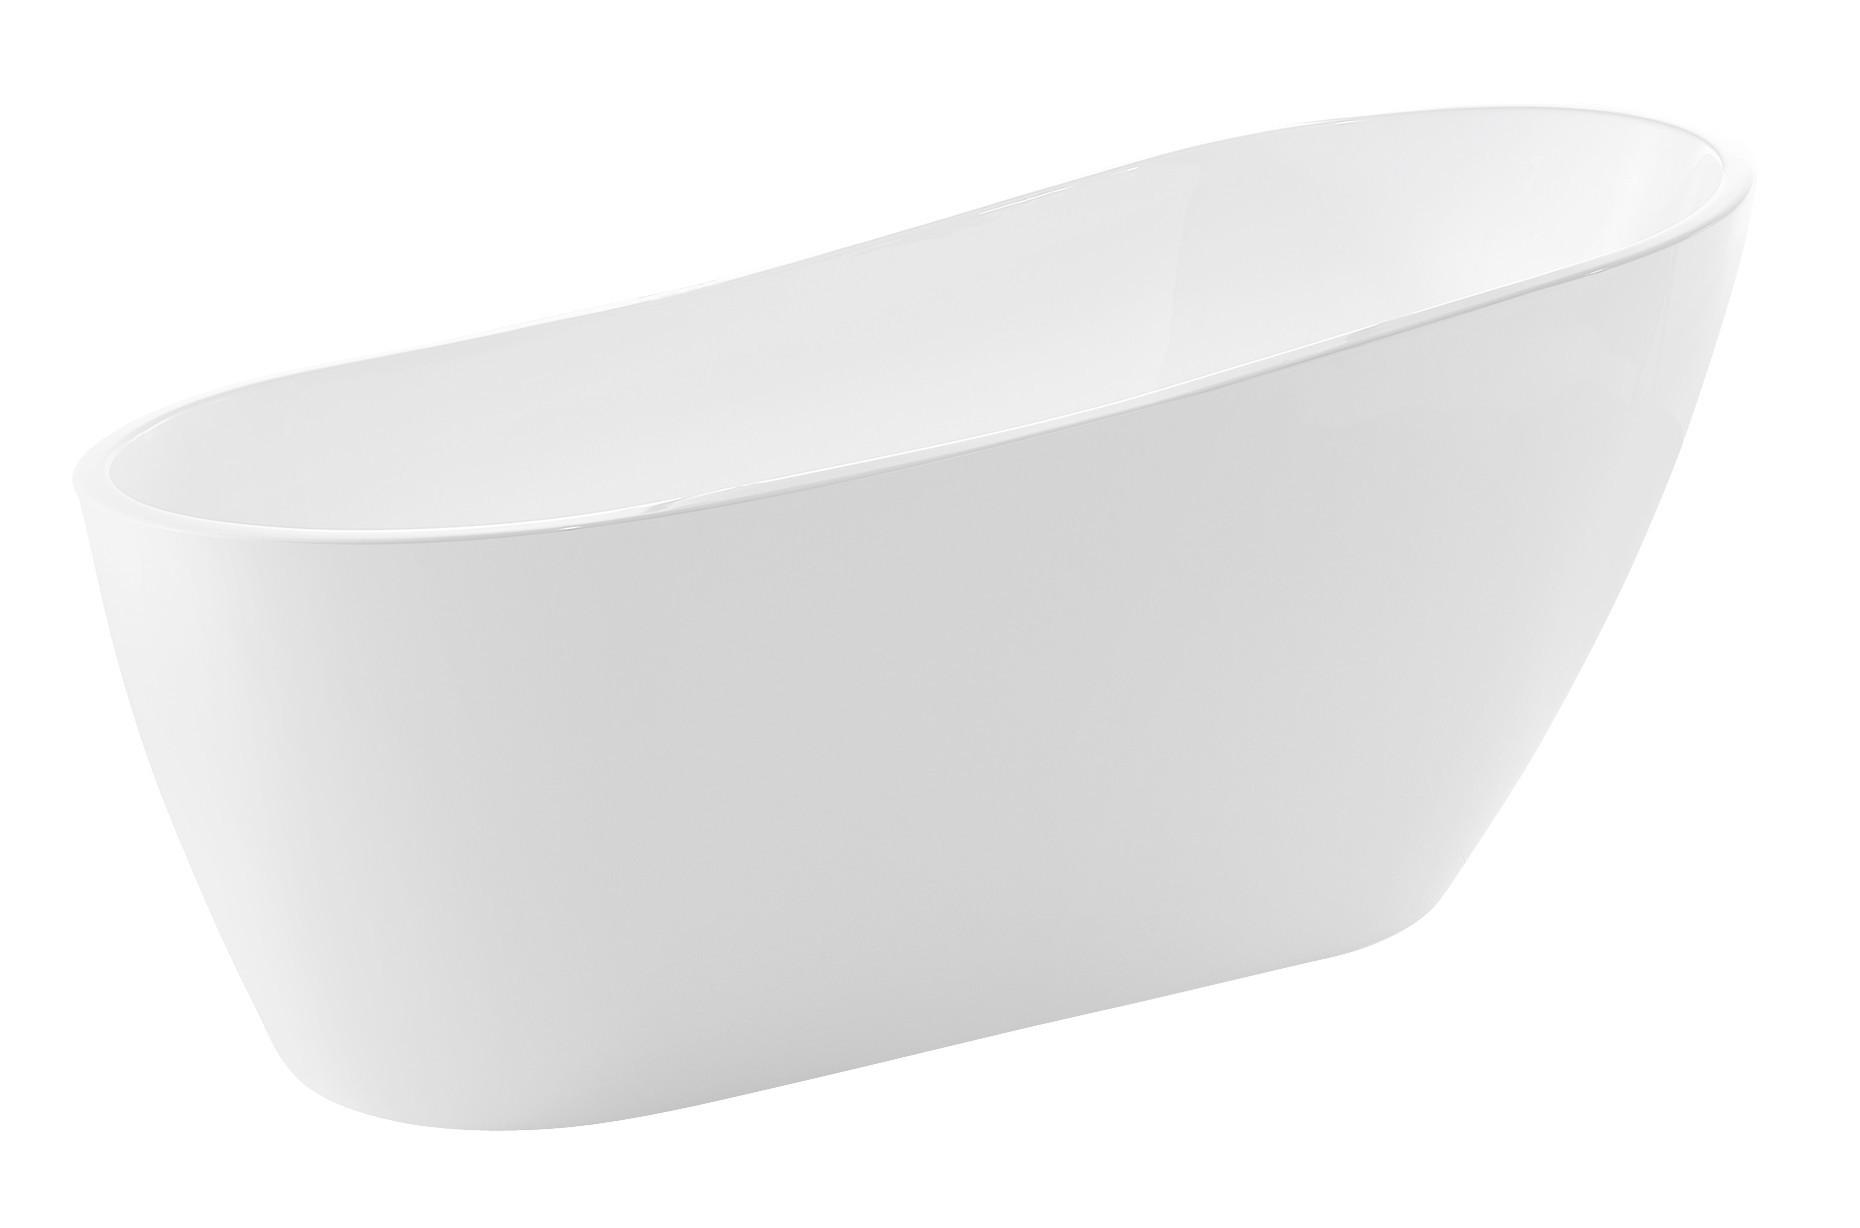 Anzzi FT-AZ093 Trend Series 5.58 ft. Freestanding Bathtub in White